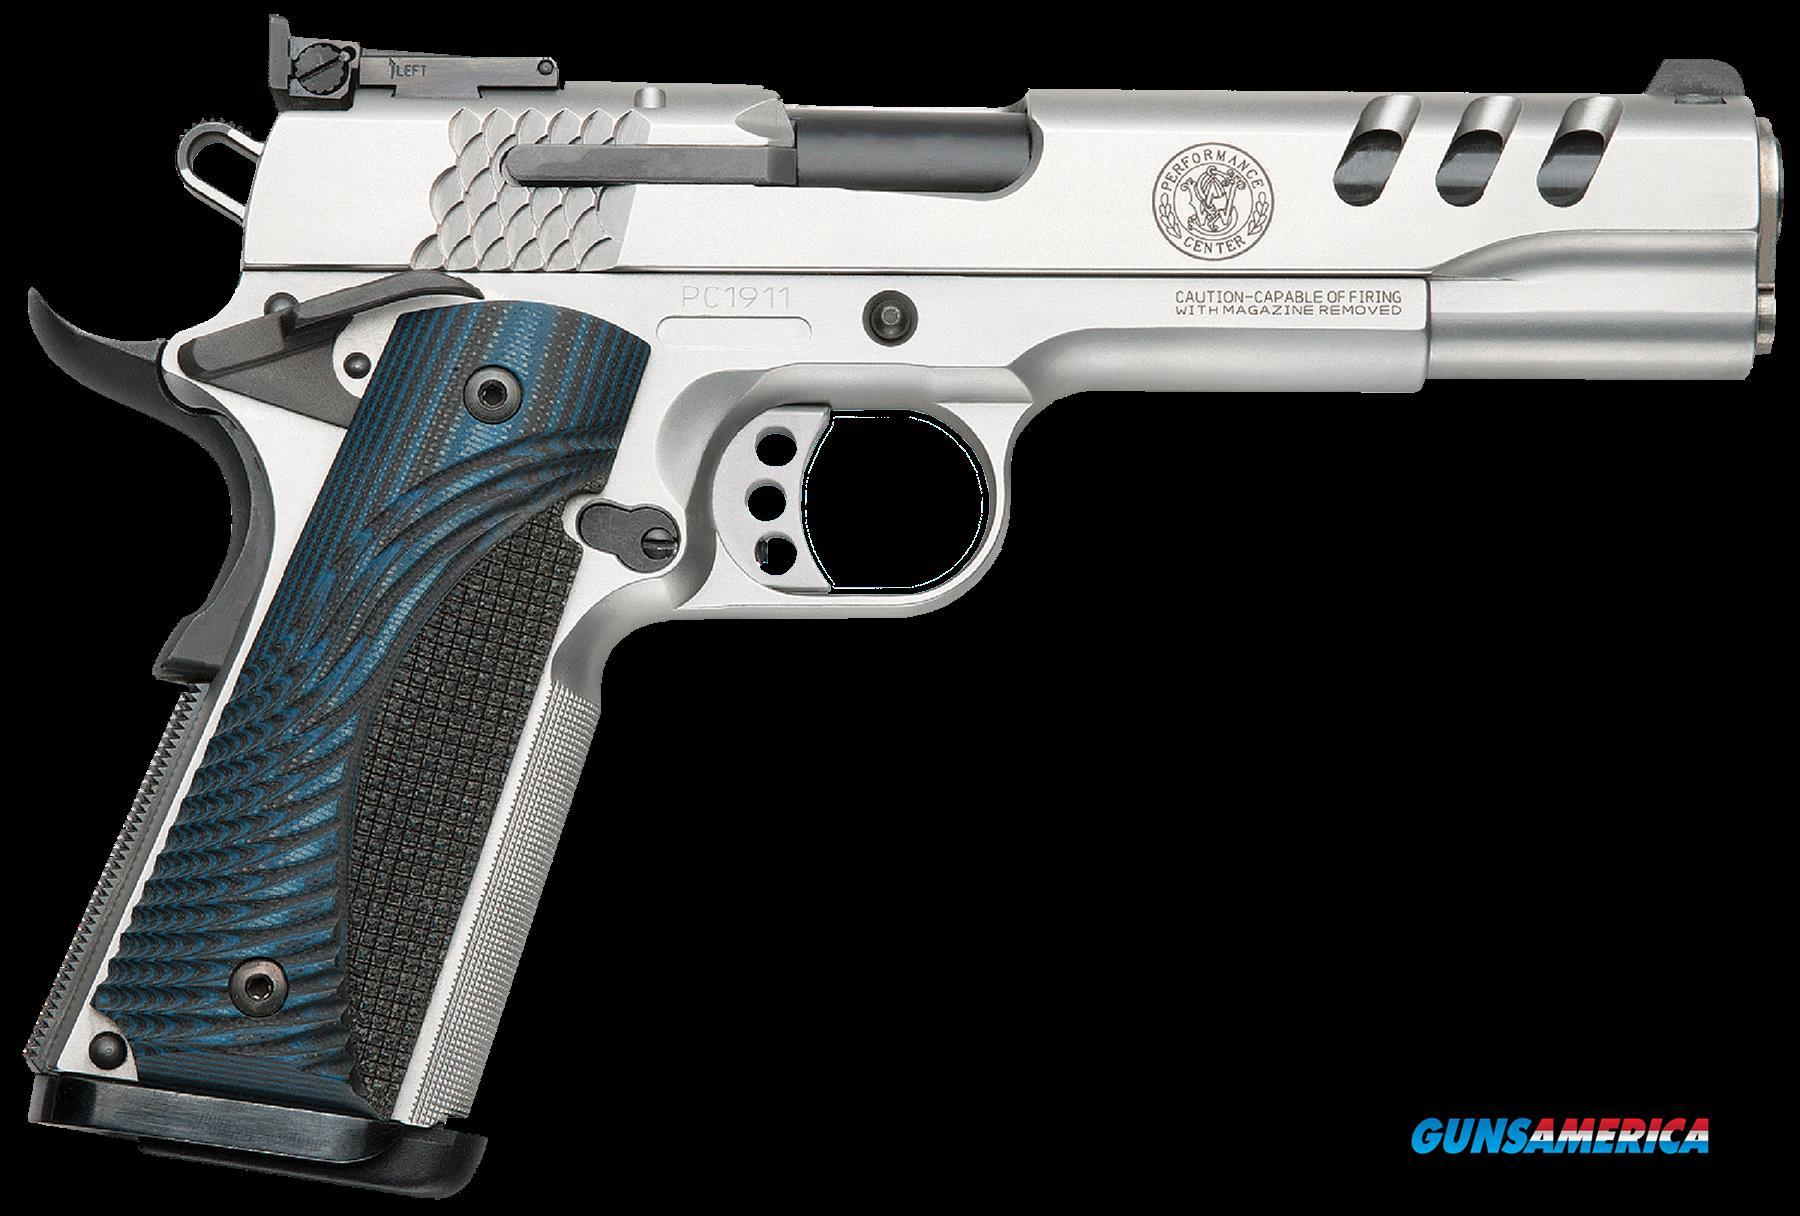 Smith & Wesson 1911, S&w M1911      170343 Pfmc 45 5  Glsbd  Guns > Pistols > 1911 Pistol Copies (non-Colt)